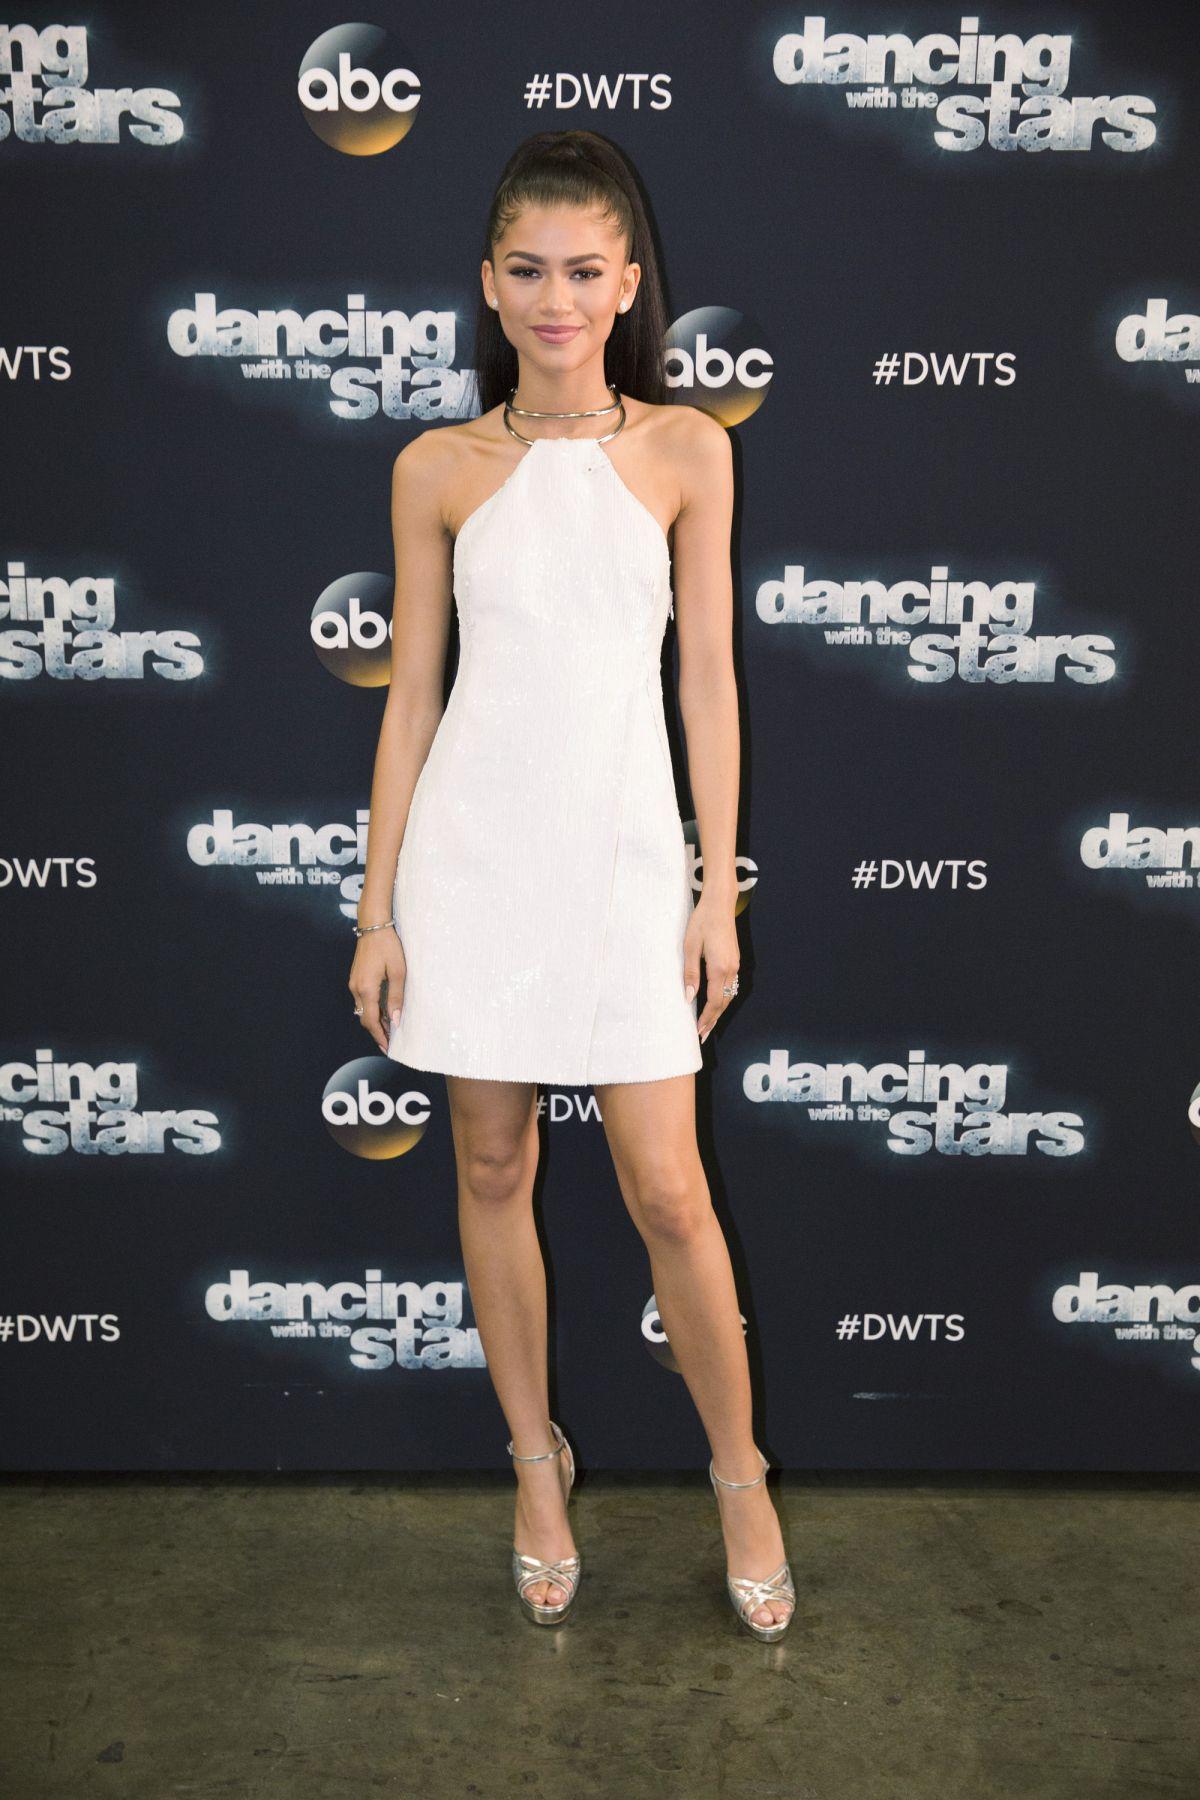 ZENDAYA COLEMAN at DWTS Season 22 in Los Angeles 04/11/2016